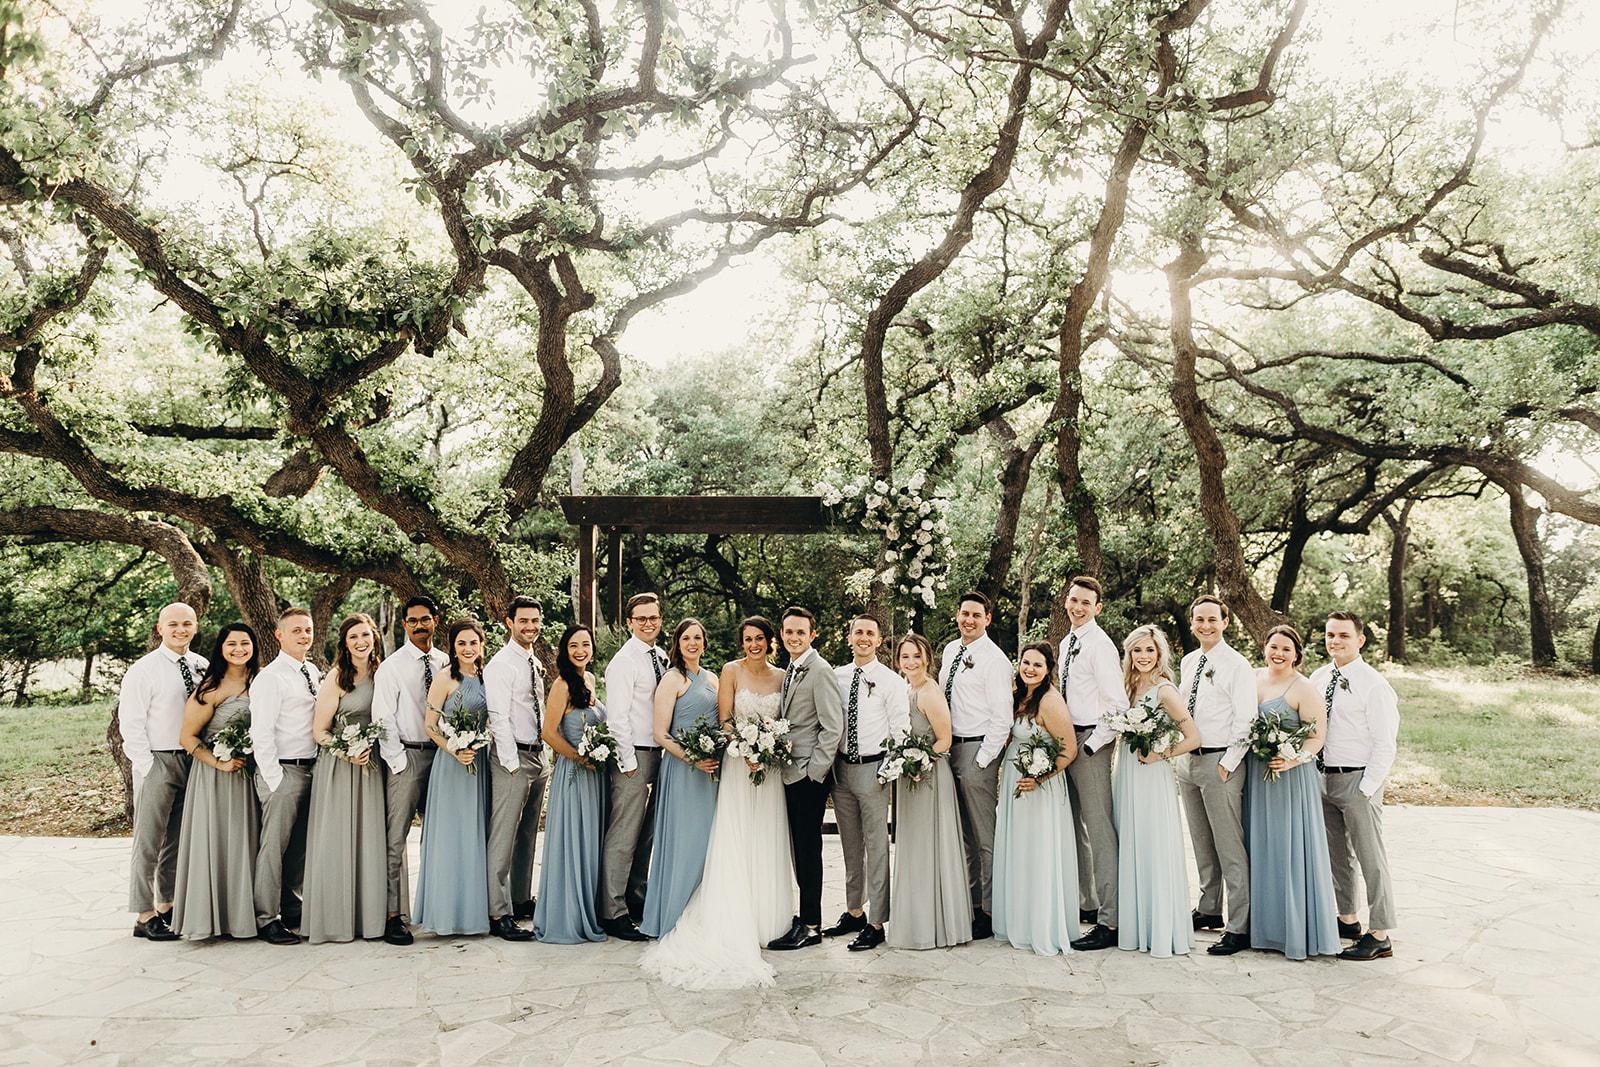 austin-wedding-lindsey-bryce-447.jpg